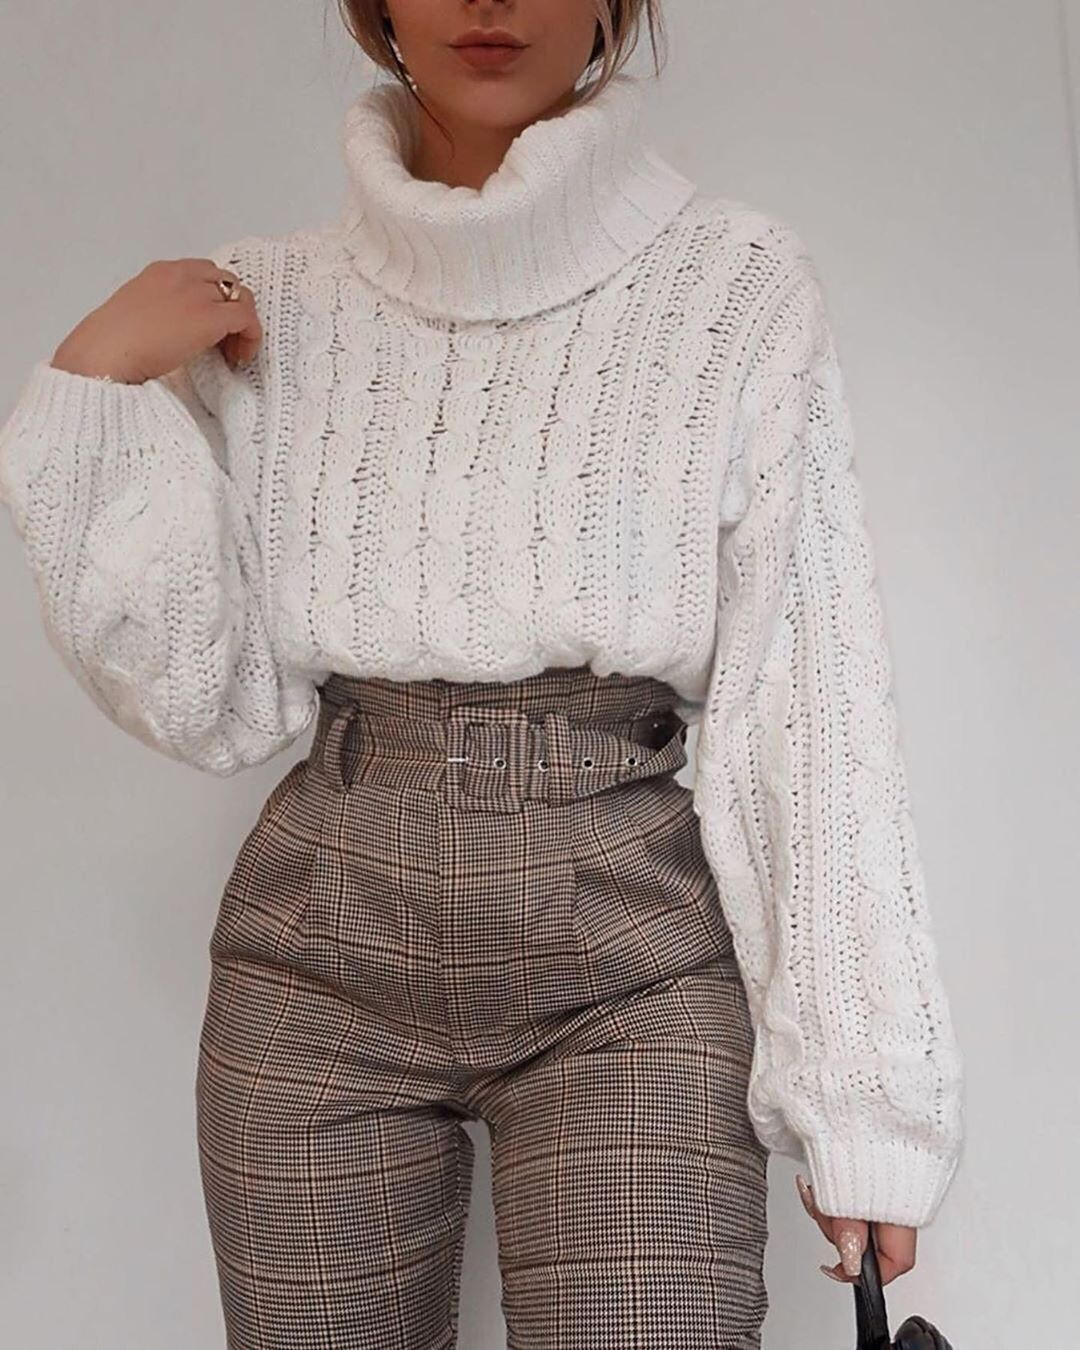 Idées de tenues - Feed Instagram - Cute Outfit